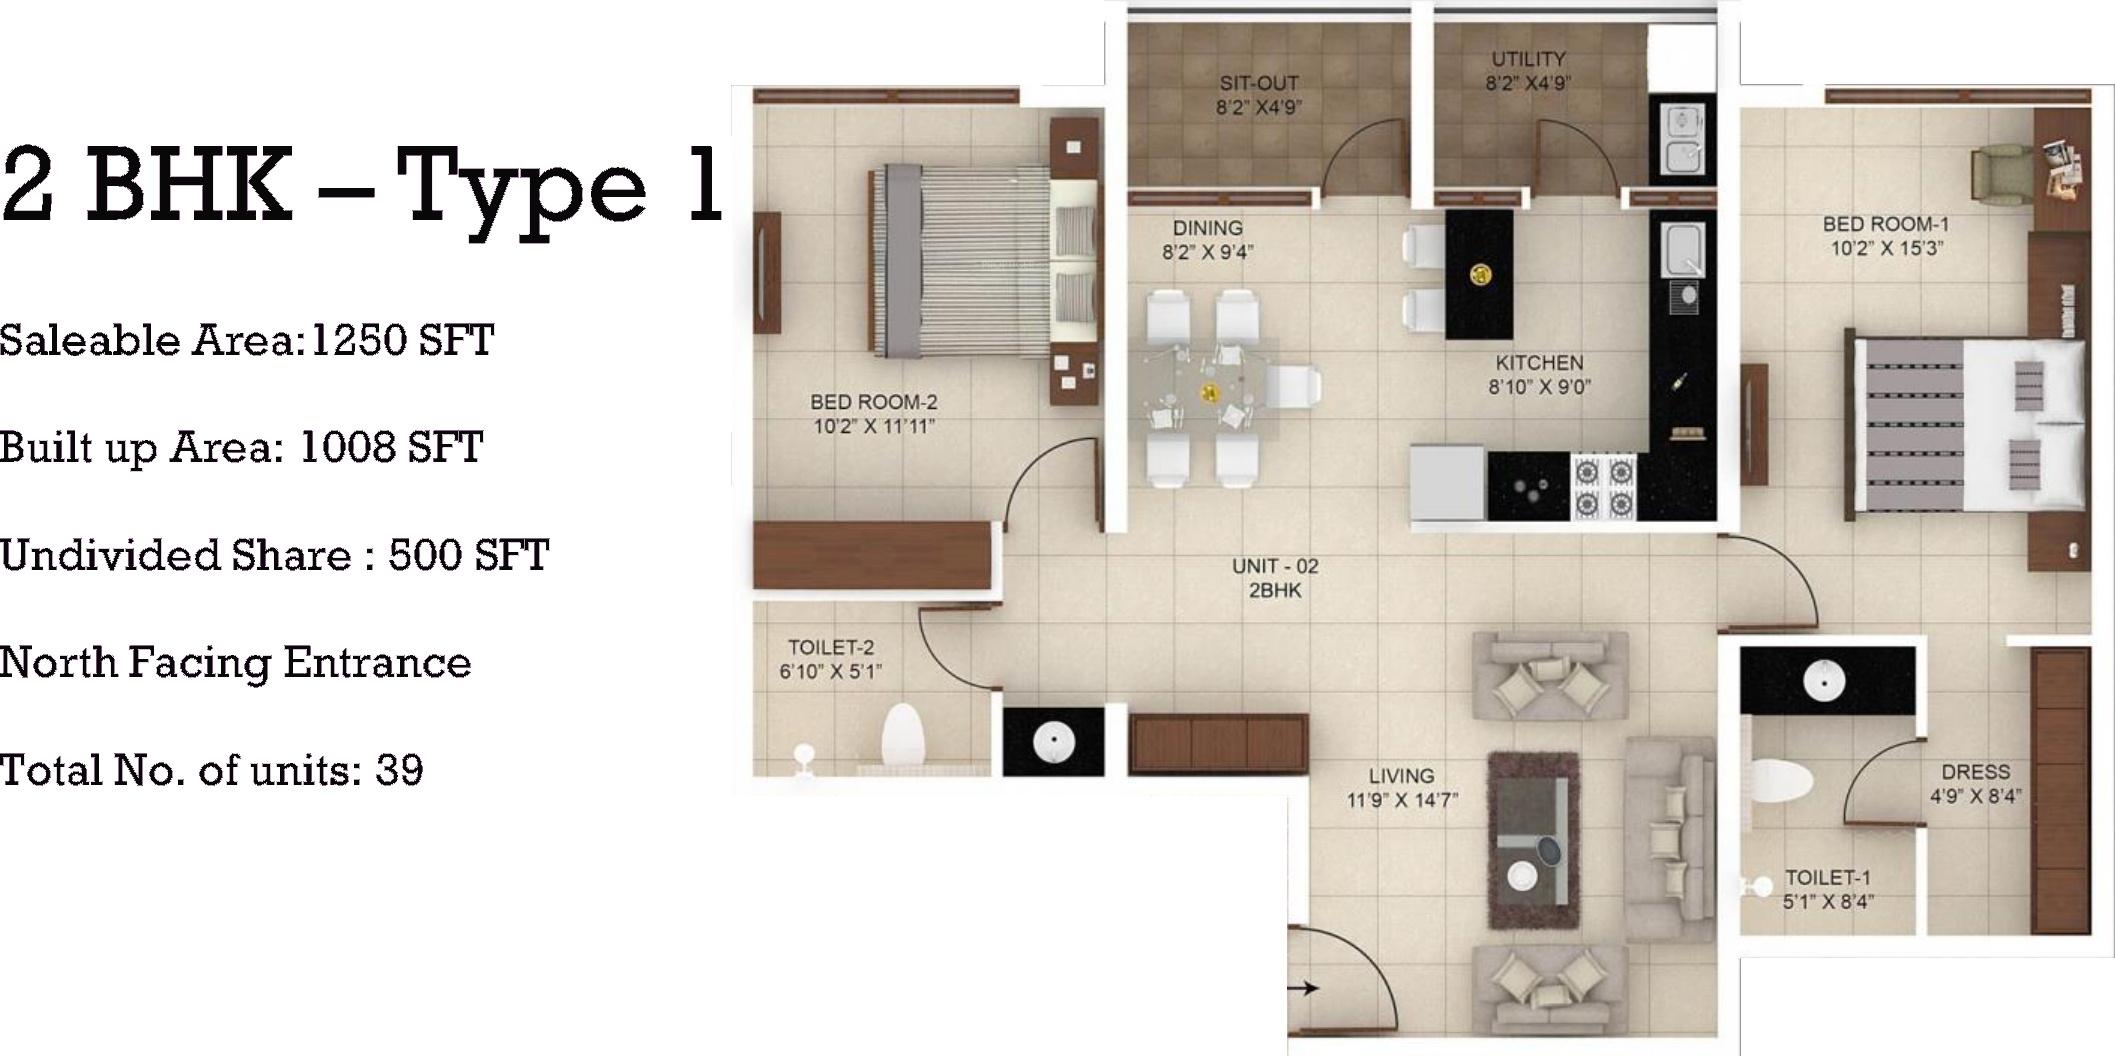 Greystone homes floor plans floor matttroy for Greystone homes floor plans